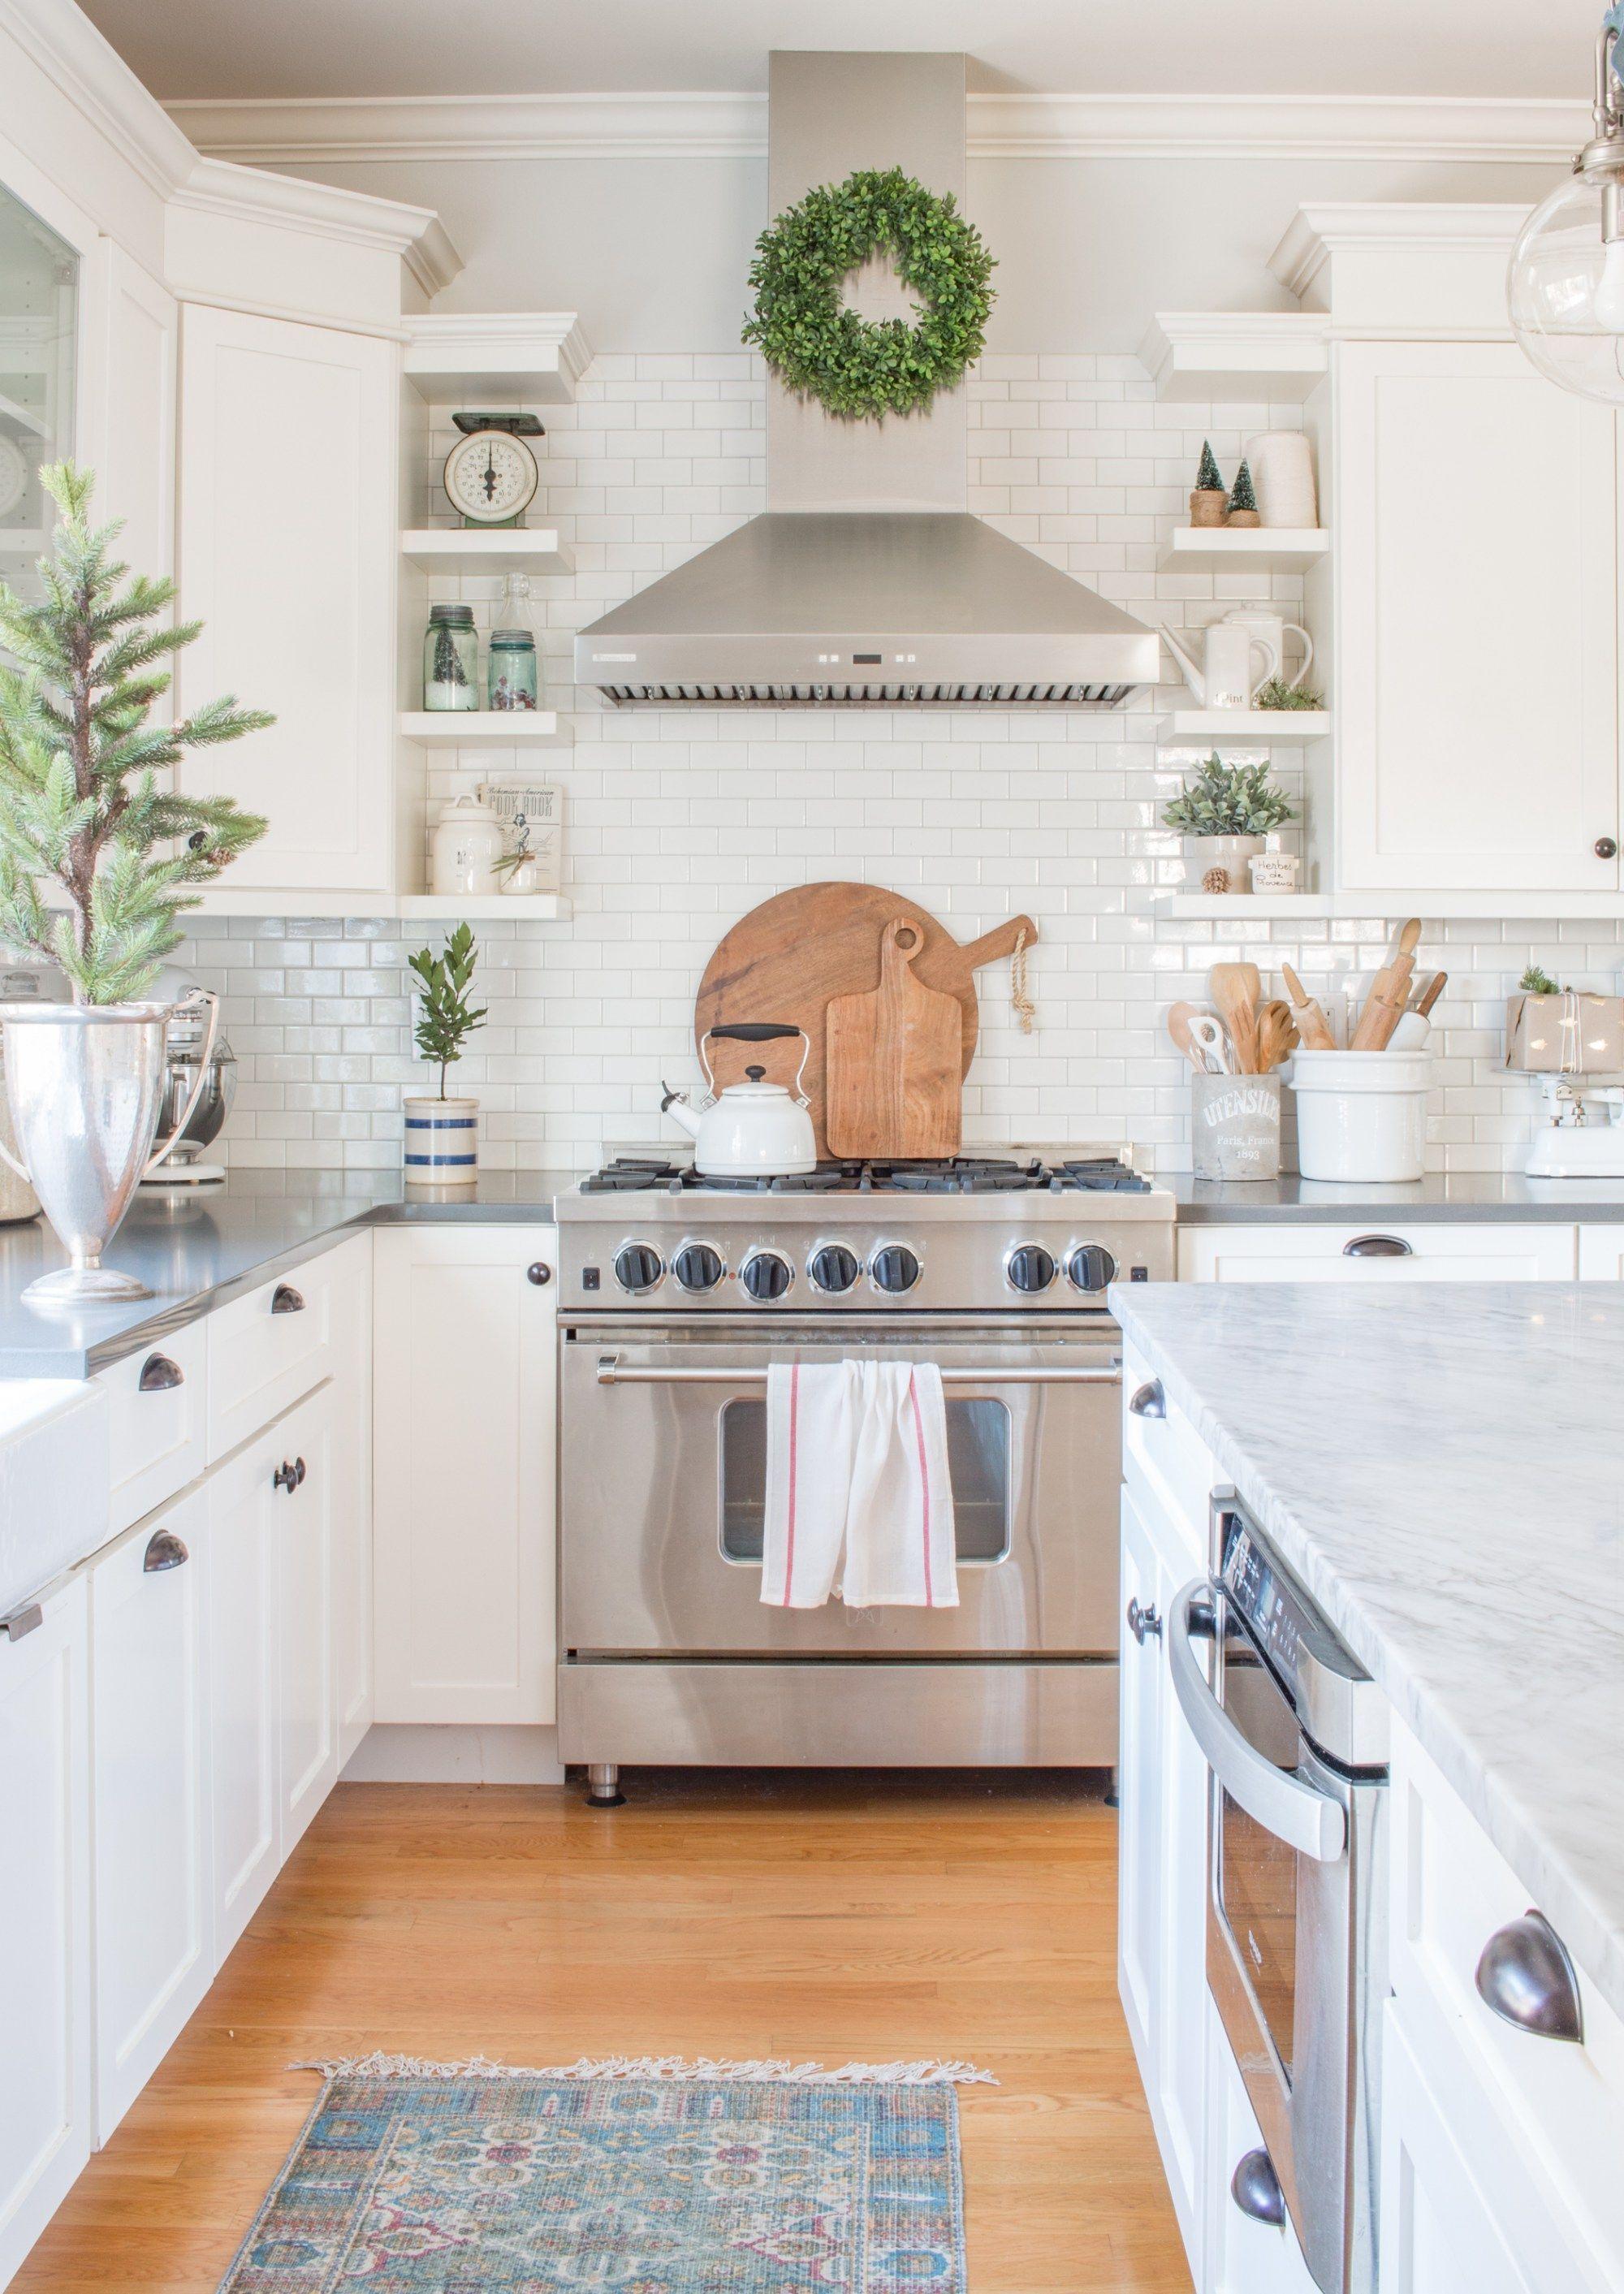 25 Kitchen Decorating Ideas | Kitchens, Kitchen design and Kitchen decor